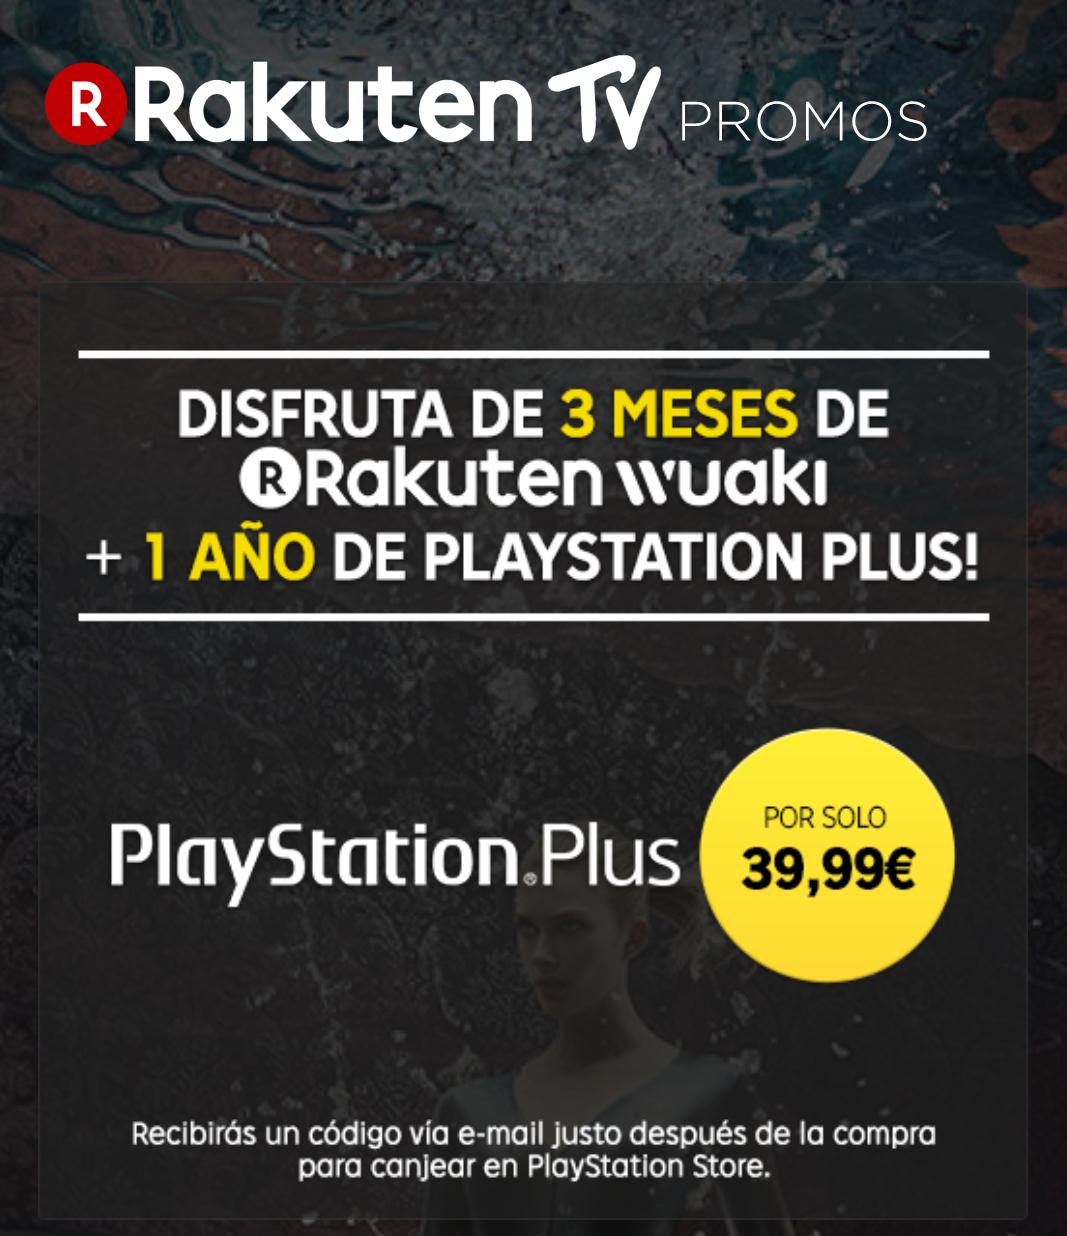 1 Año PlayStation Plus y 3 Meses Rakuten Wuaki